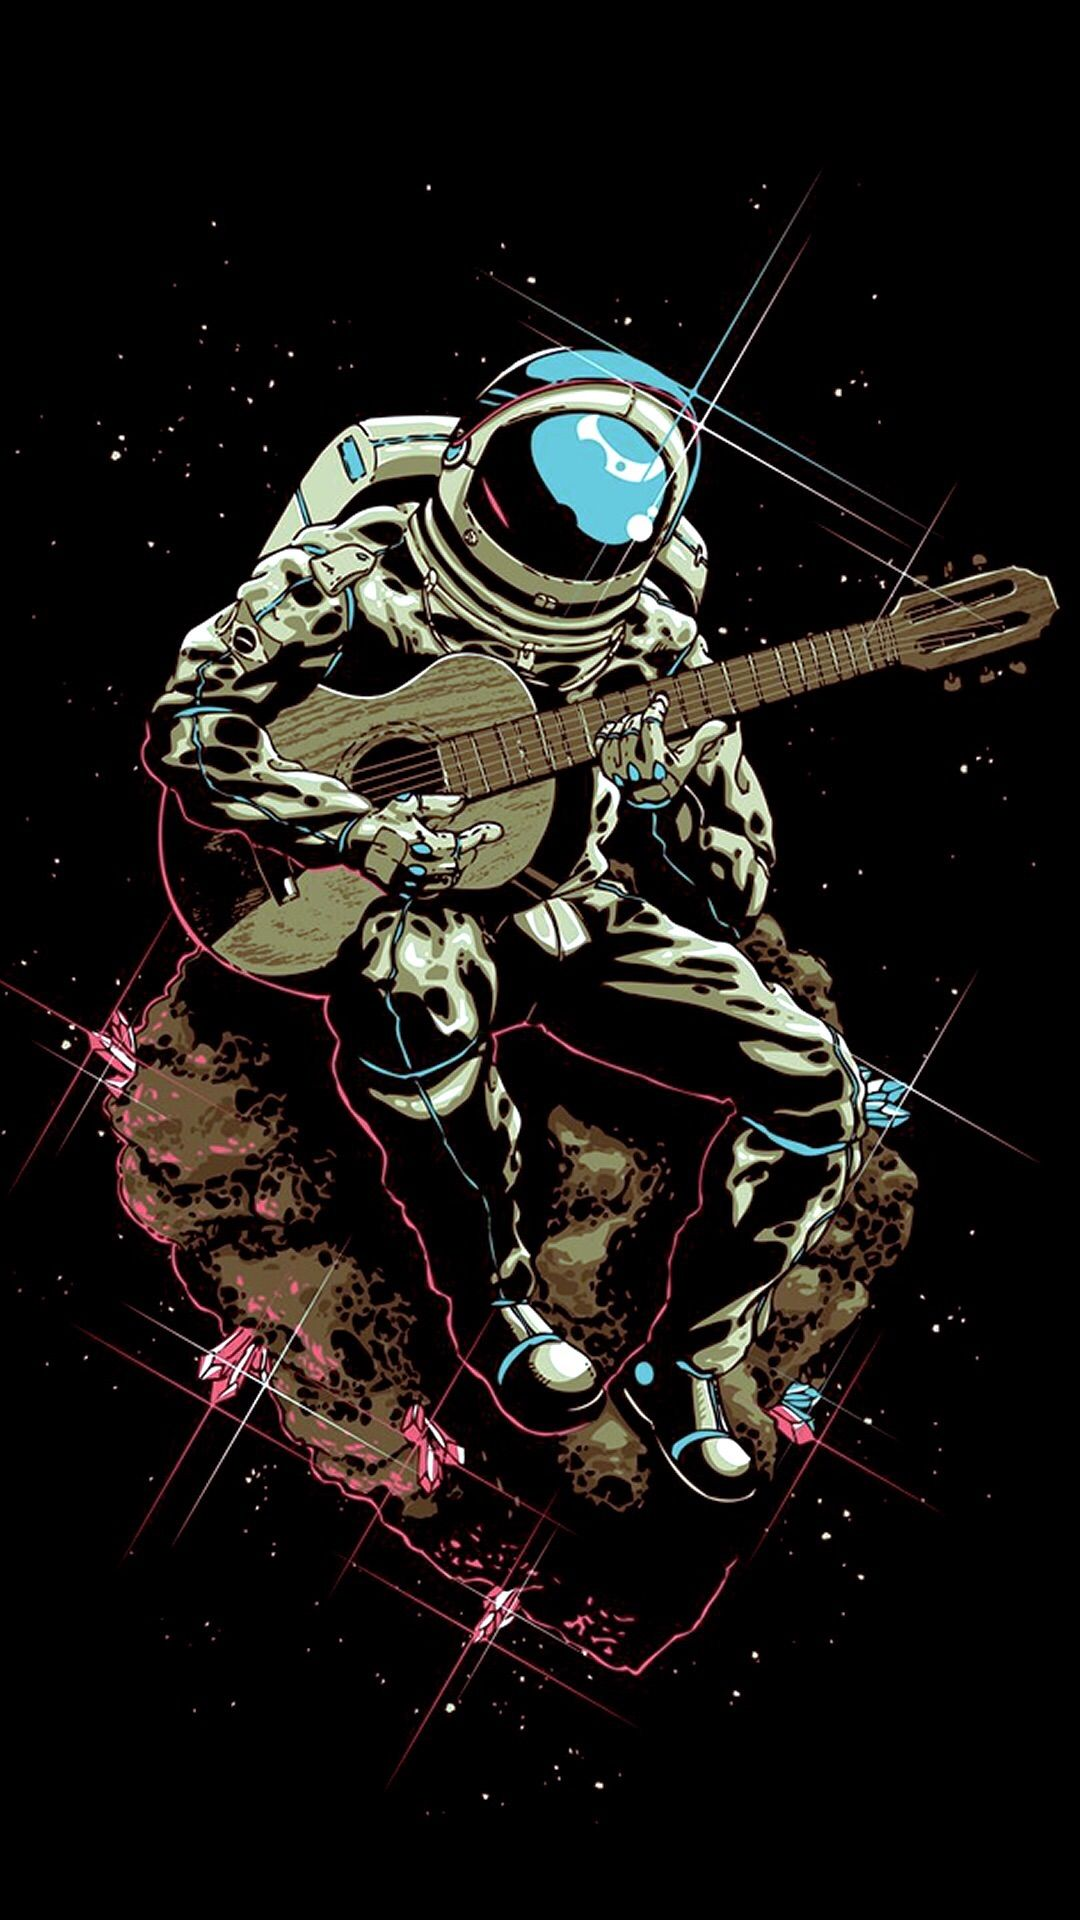 Phone Wallpaper Dump 4 Astronaut Art Space Art Space Cowboys